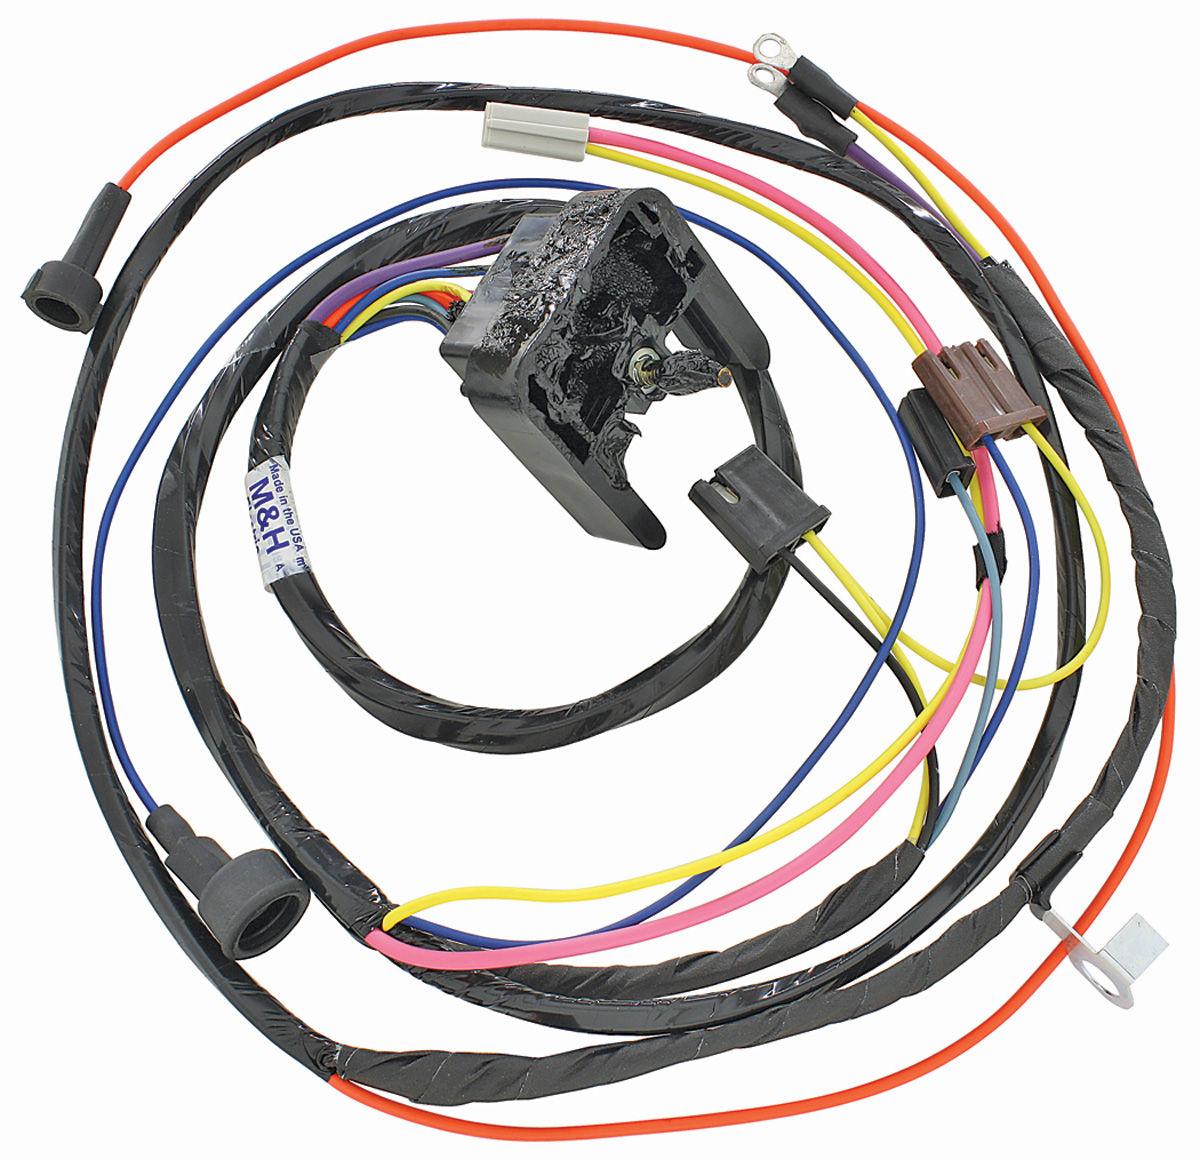 38947 lrg?v\\\\\\\\\\\\\\\=102520130818 1968 chevelle dash wiring diagram free download new wiring